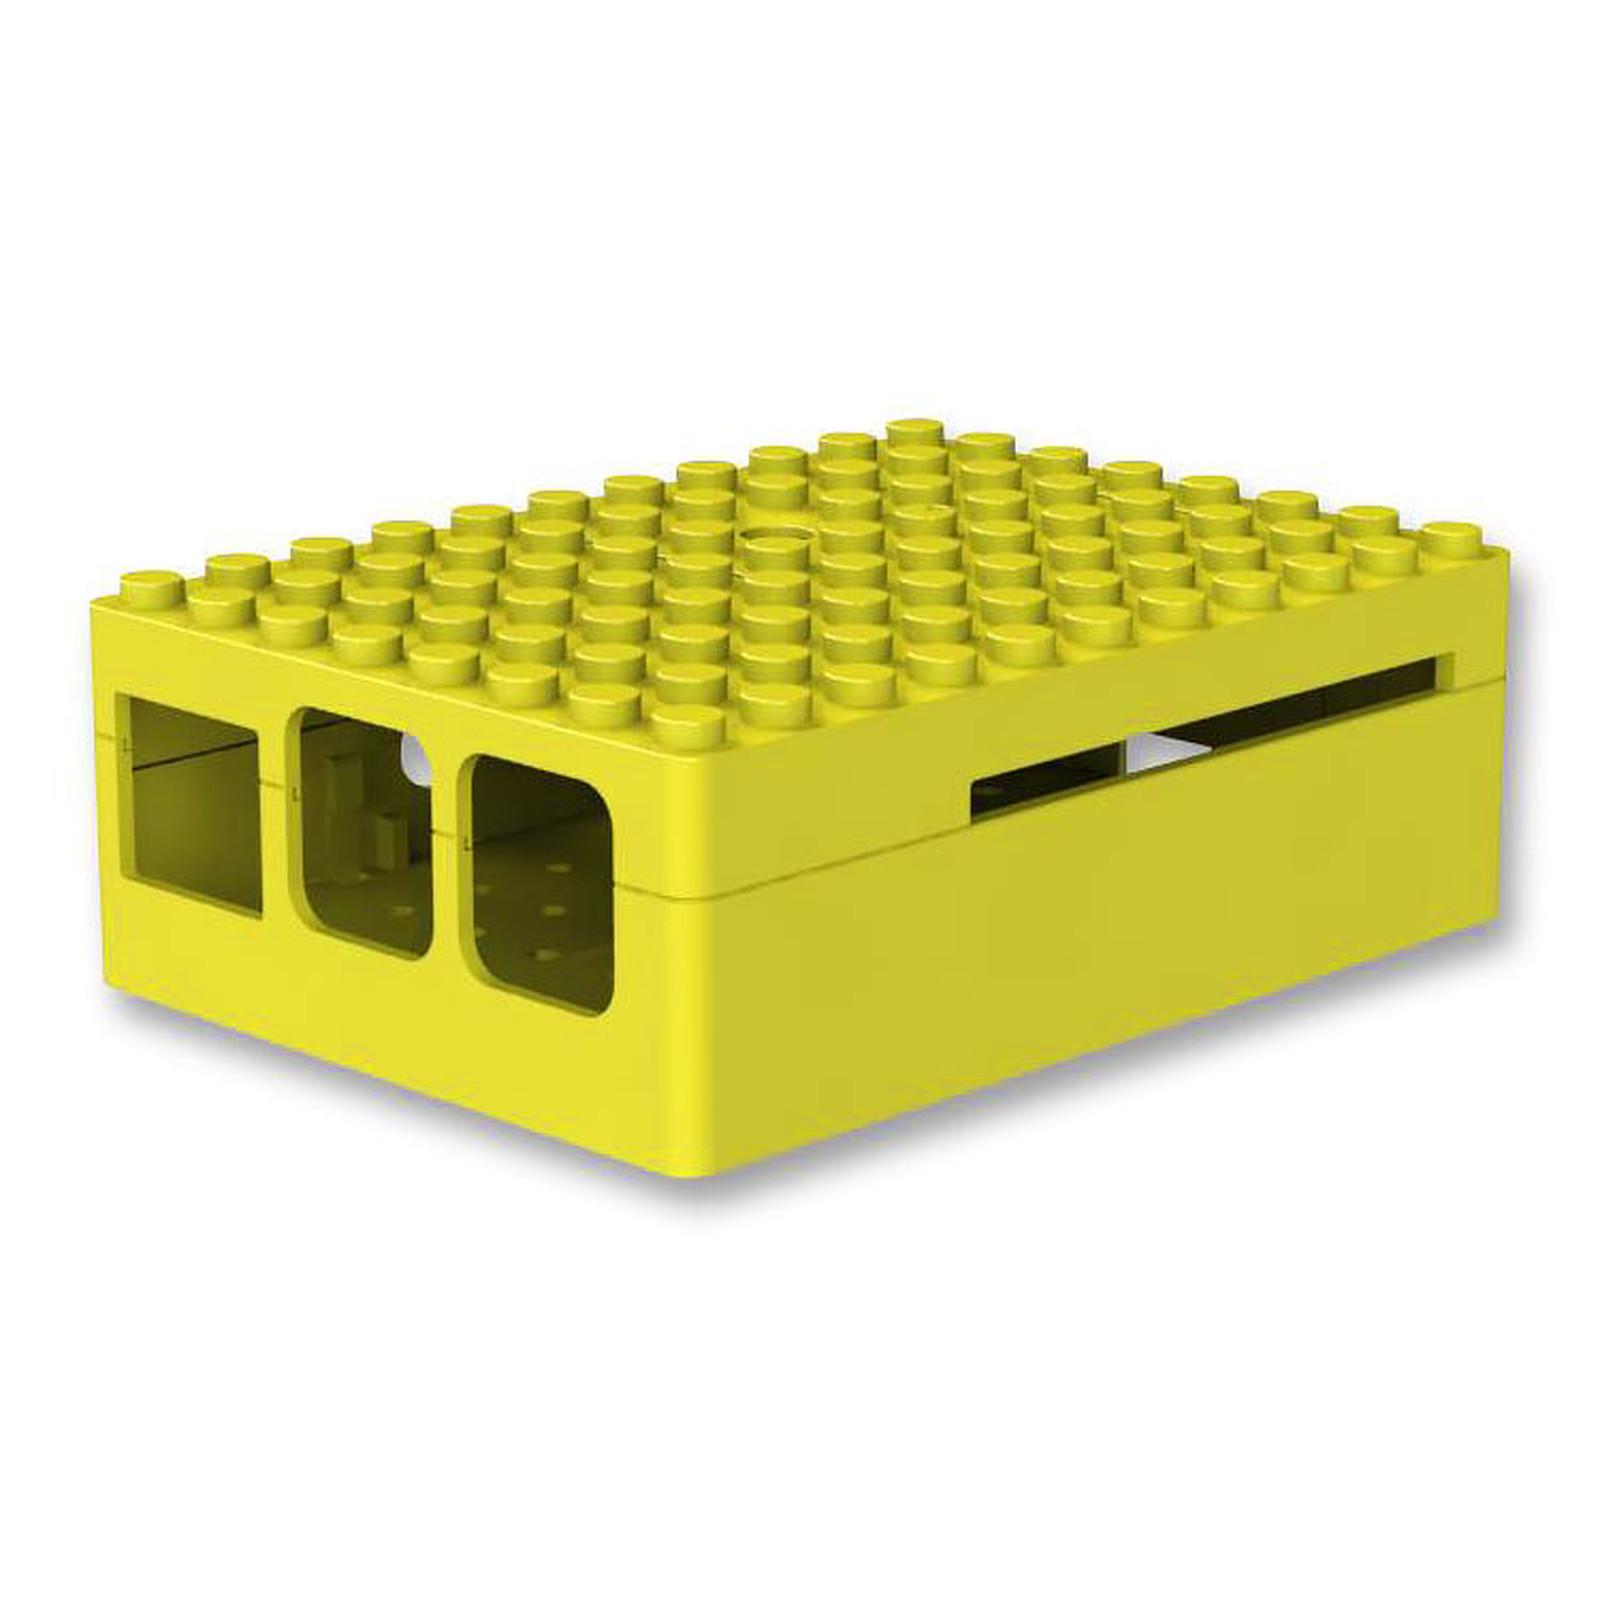 Multicomp Pi-Blox caja para Raspberry Pi 1 Model B+ / Pi 2/3 (amarilla)